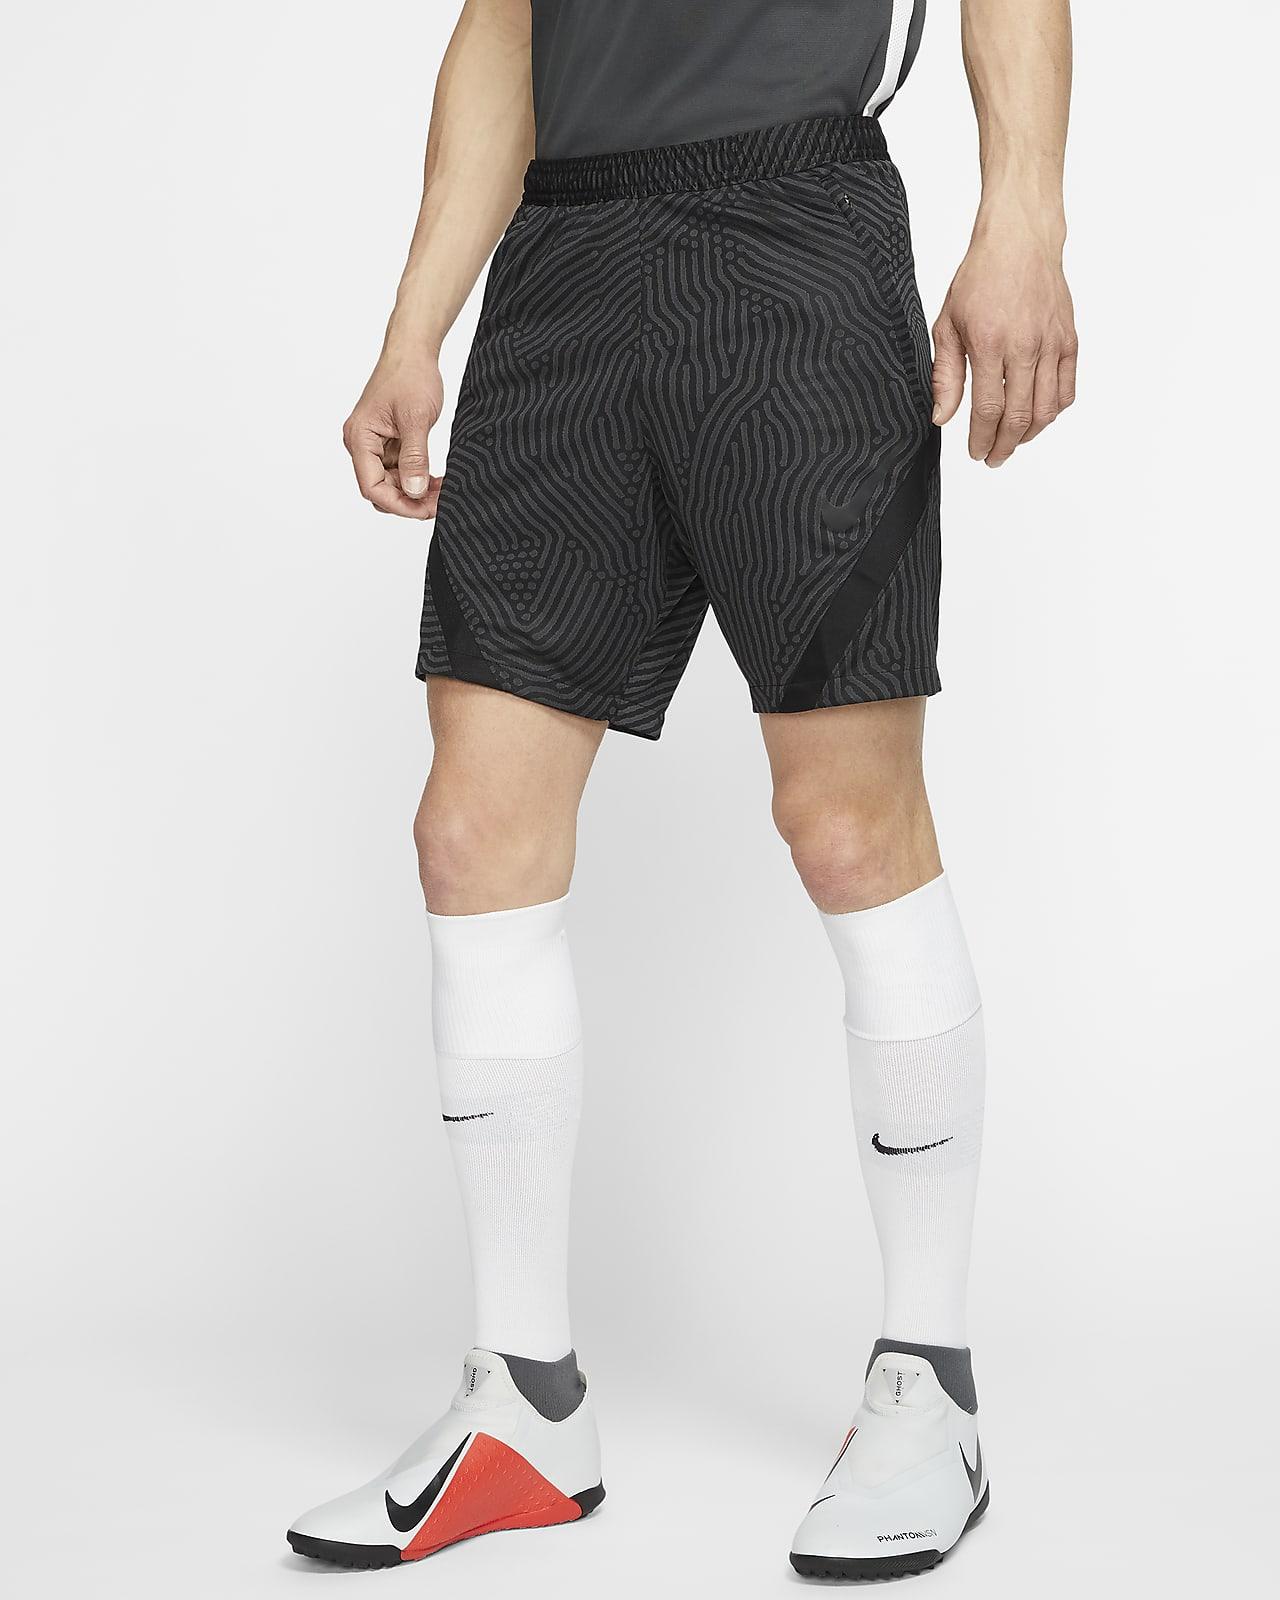 Nike Dri-FIT Strike Men's Soccer Shorts